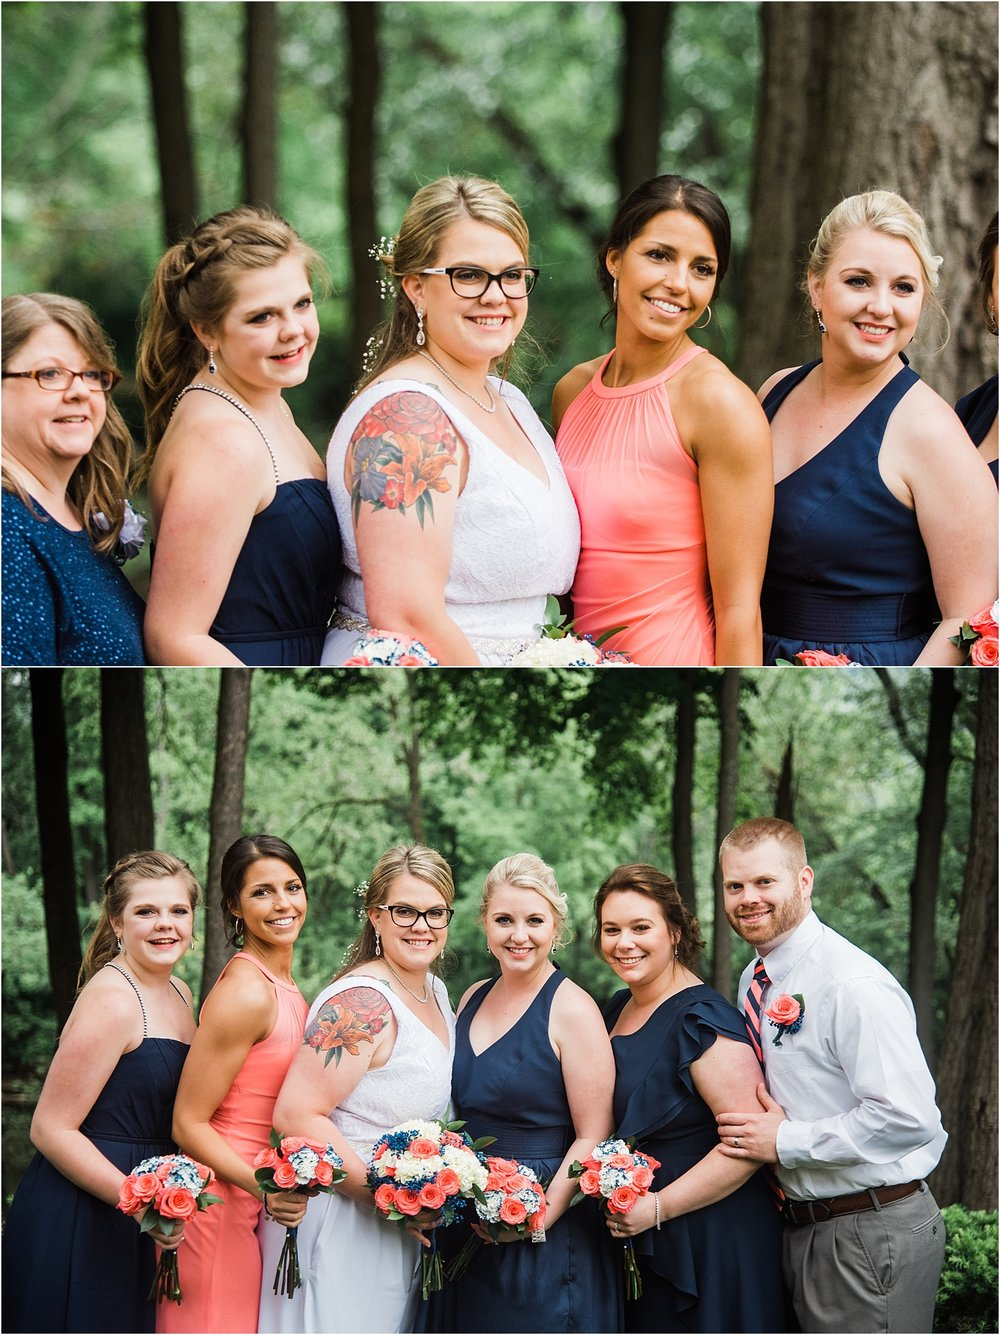 The_Riverview_Simsbury_Connecticut_Wedding_LGBT_Weddings_037.jpg